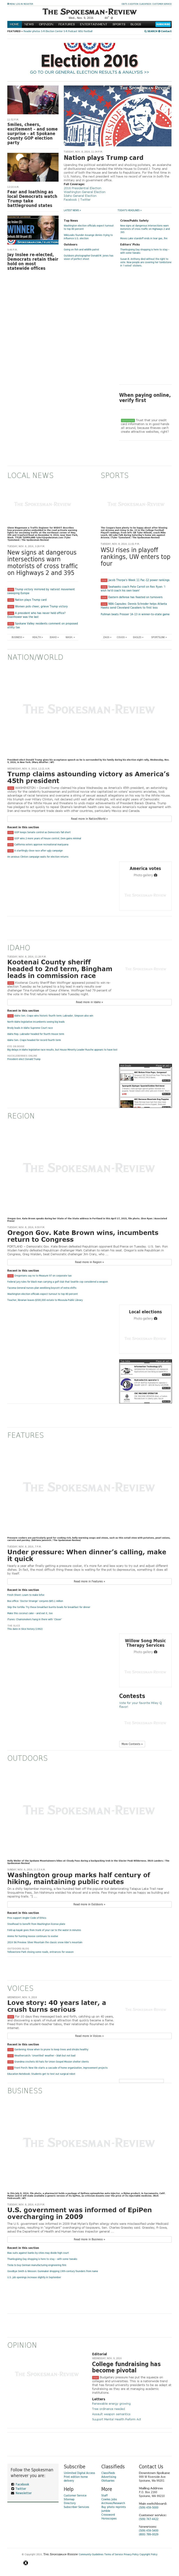 The (Spokane) Spokesman-Review at Wednesday Nov. 9, 2016, 9:22 a.m. UTC